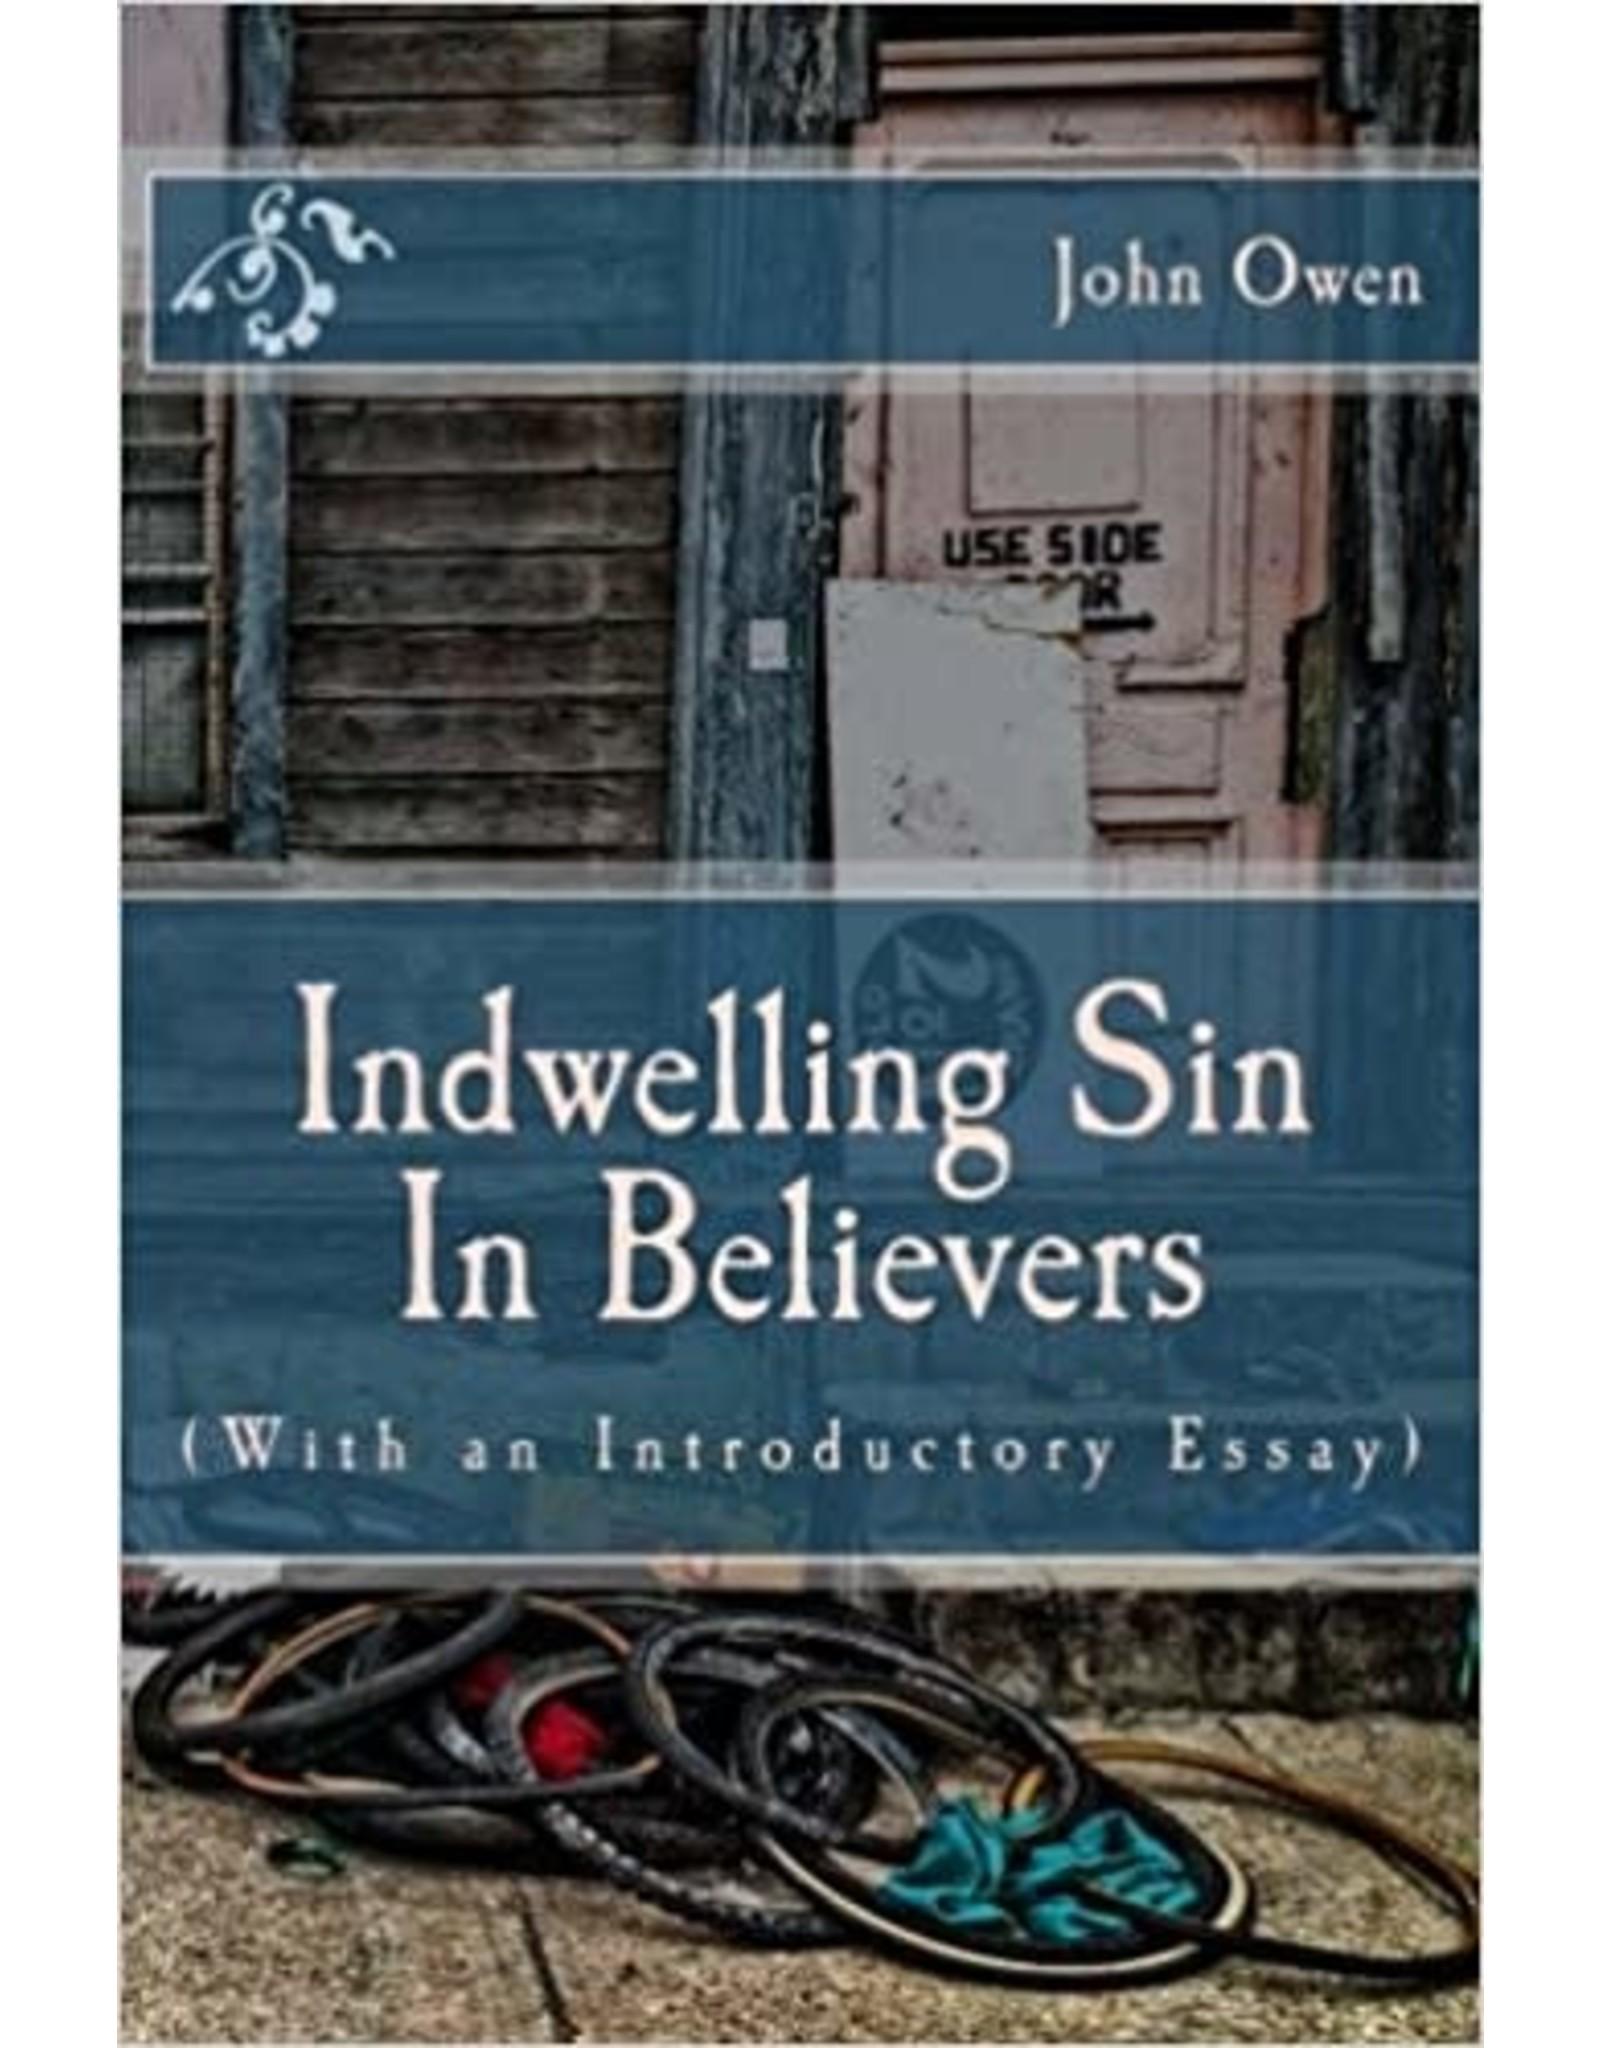 Owen Indwelling Sin in Believers